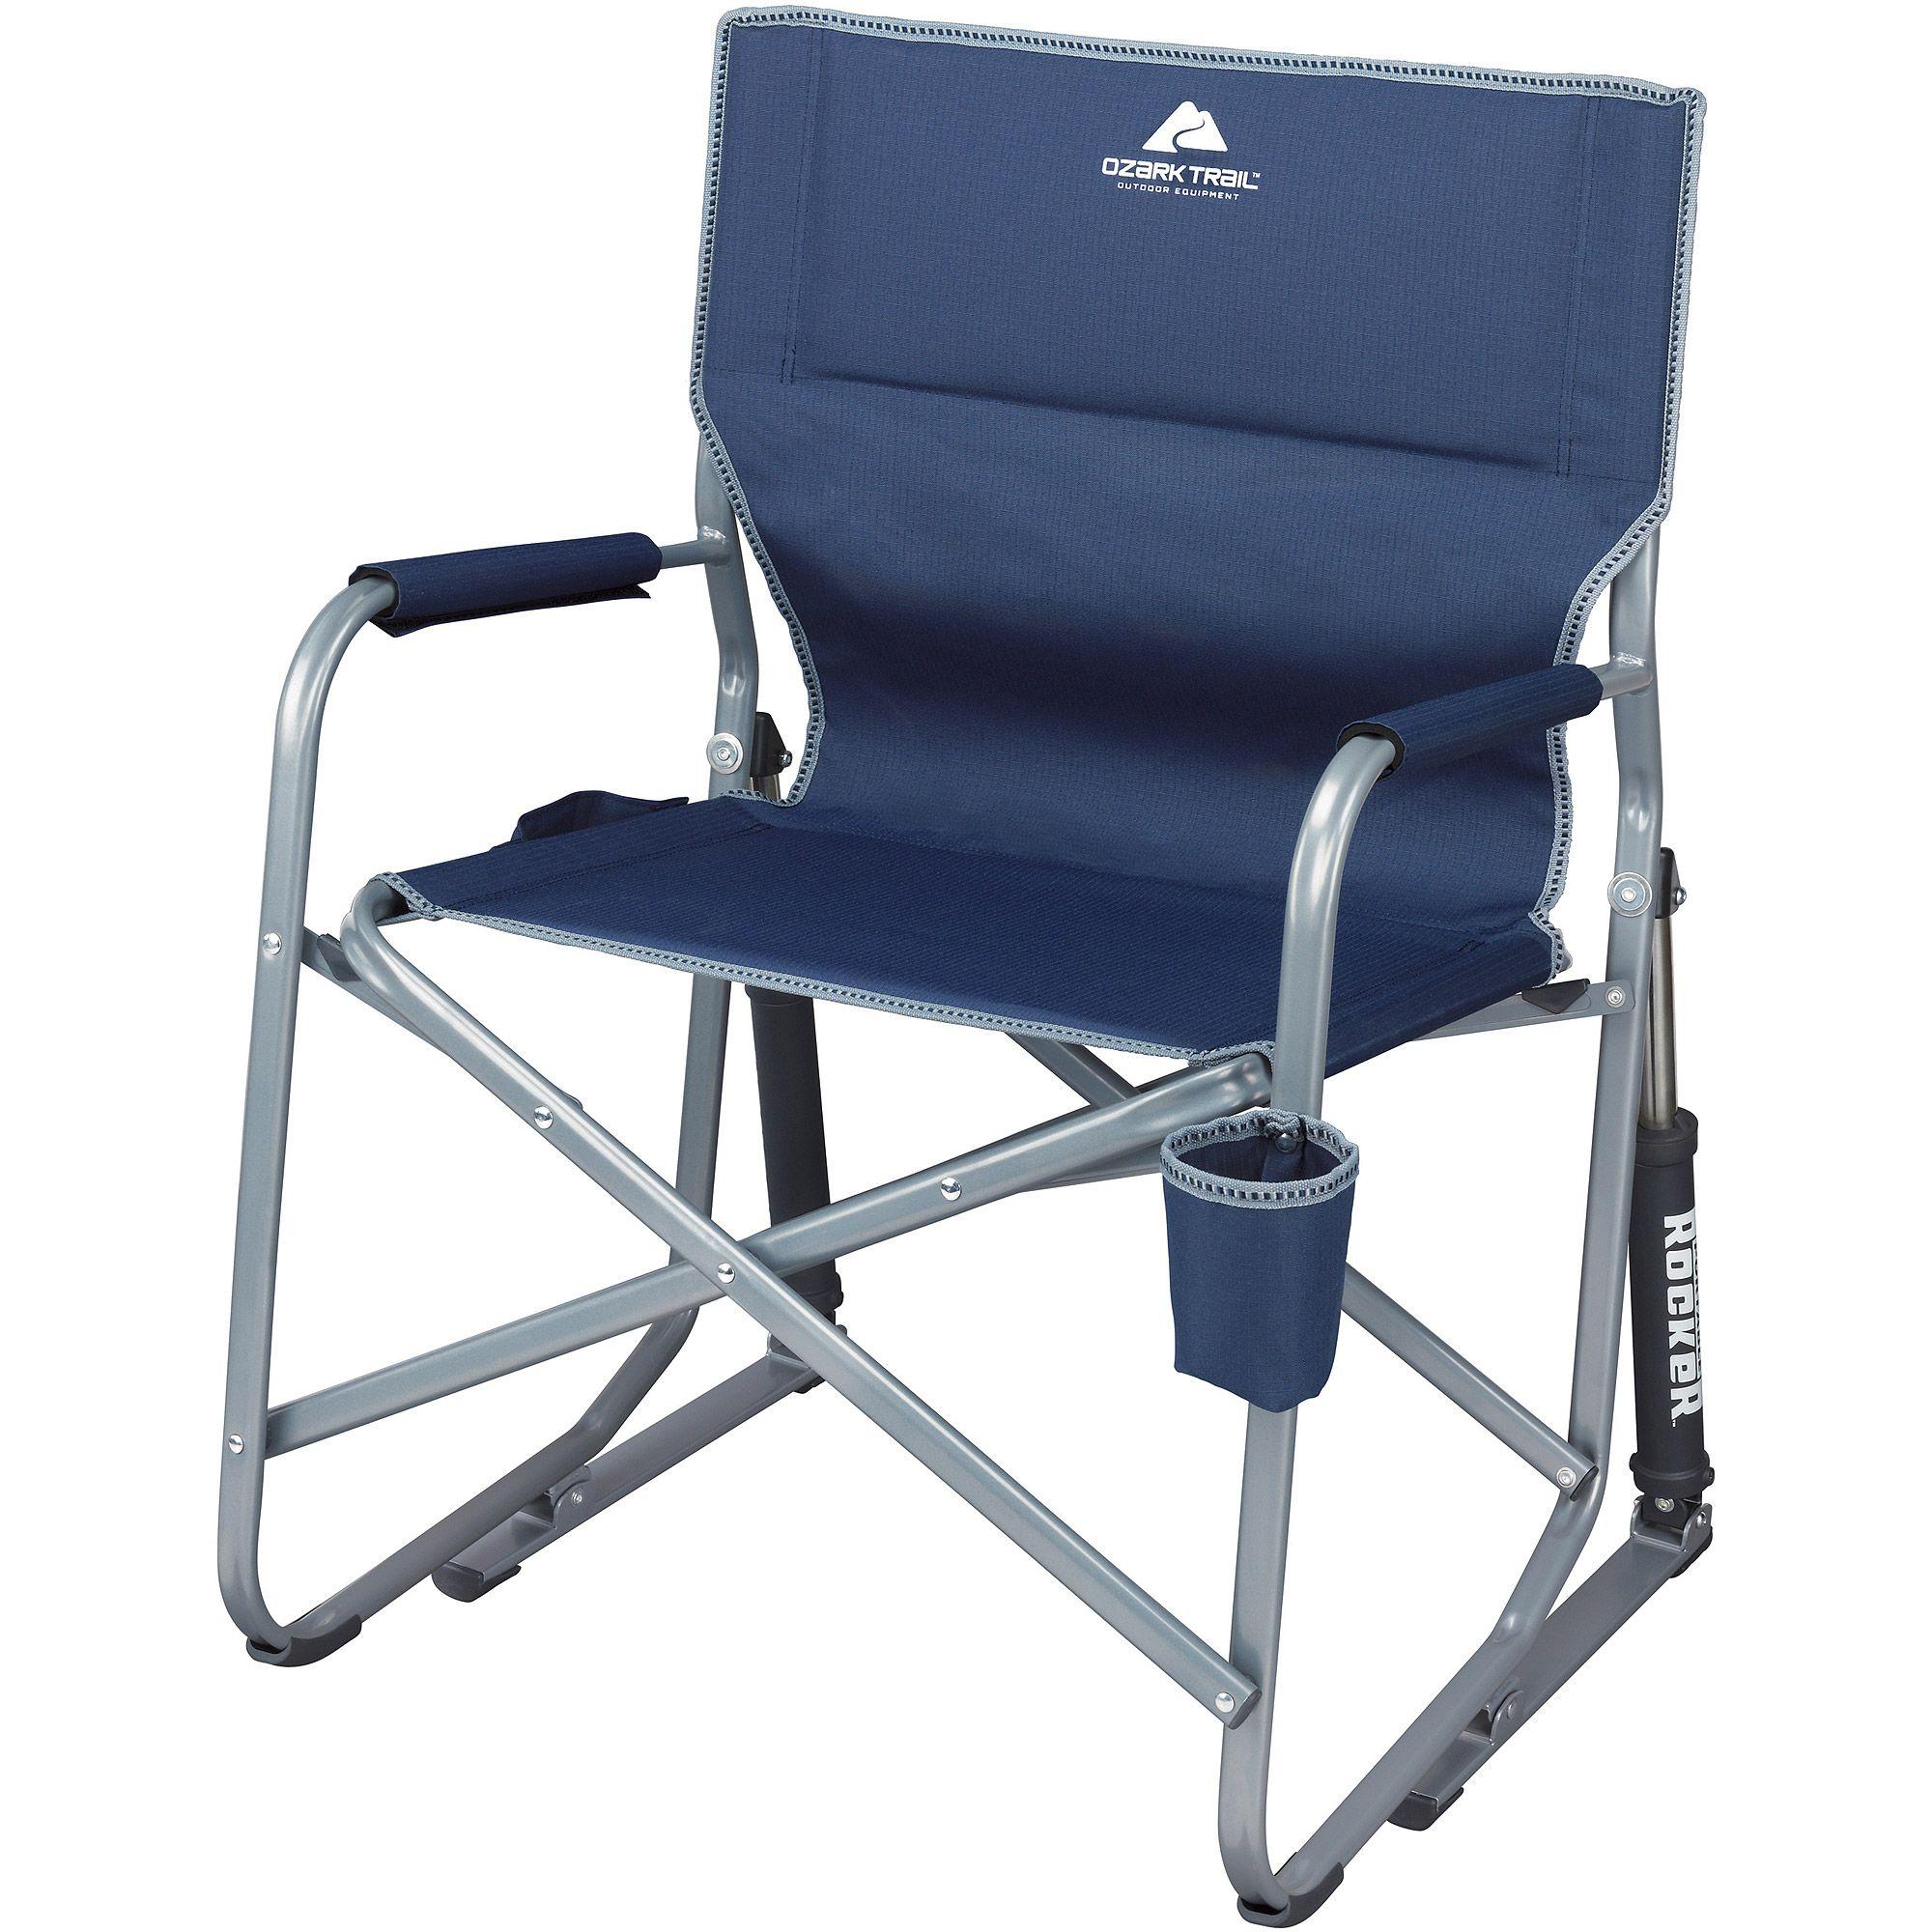 Rocking Camping Chair Visit more at